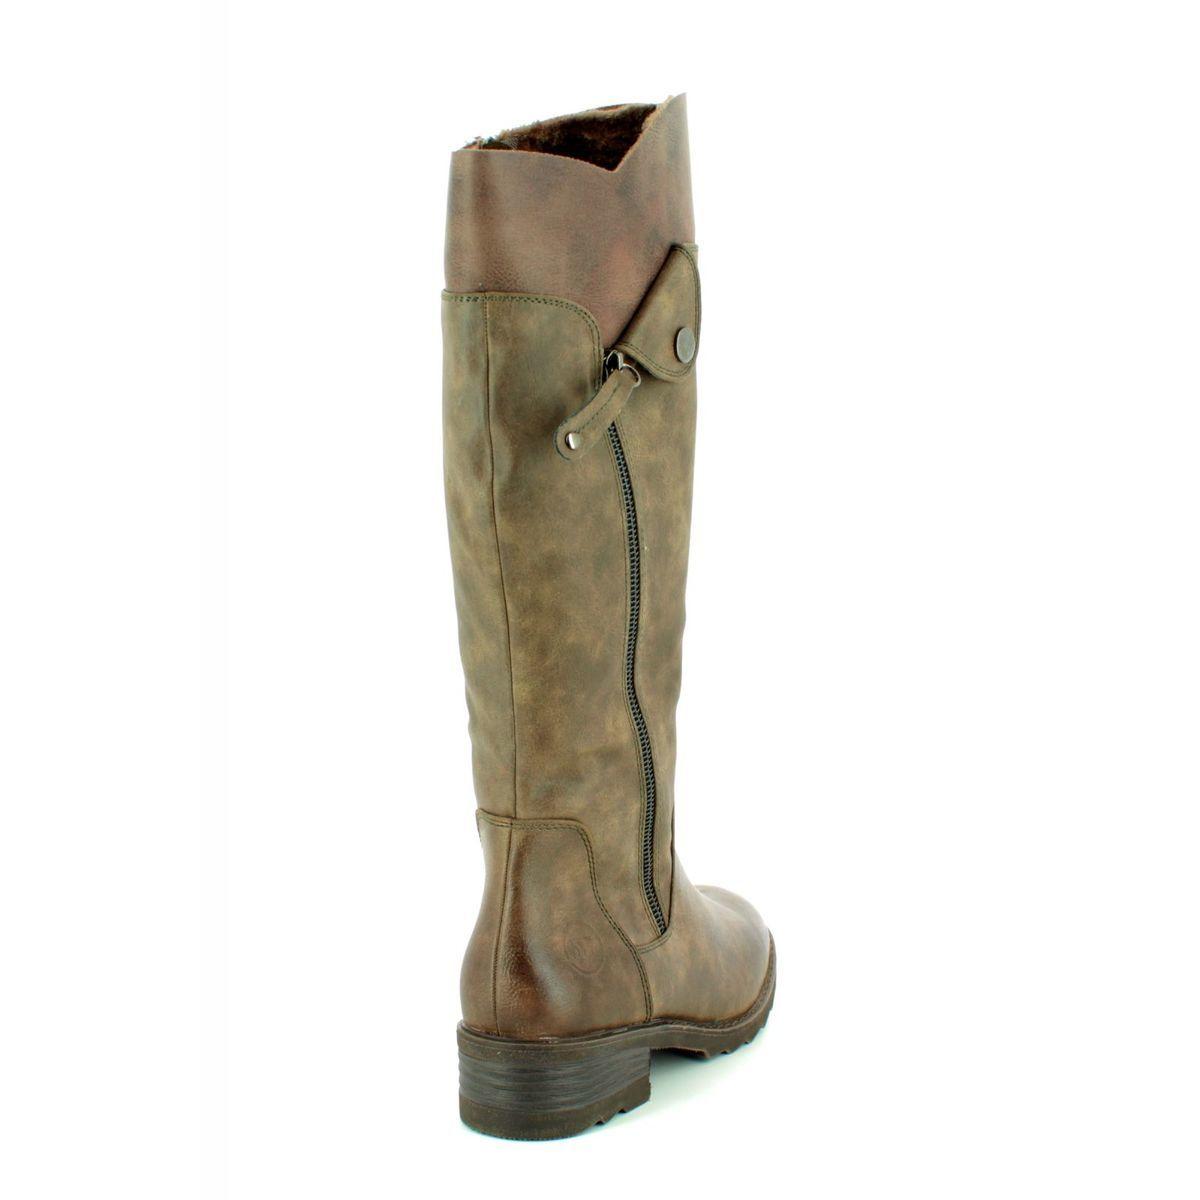 9dba70eda59 Marco Tozzi Knee-high Boots - Brown - 26639 21 358 DUSSI 85